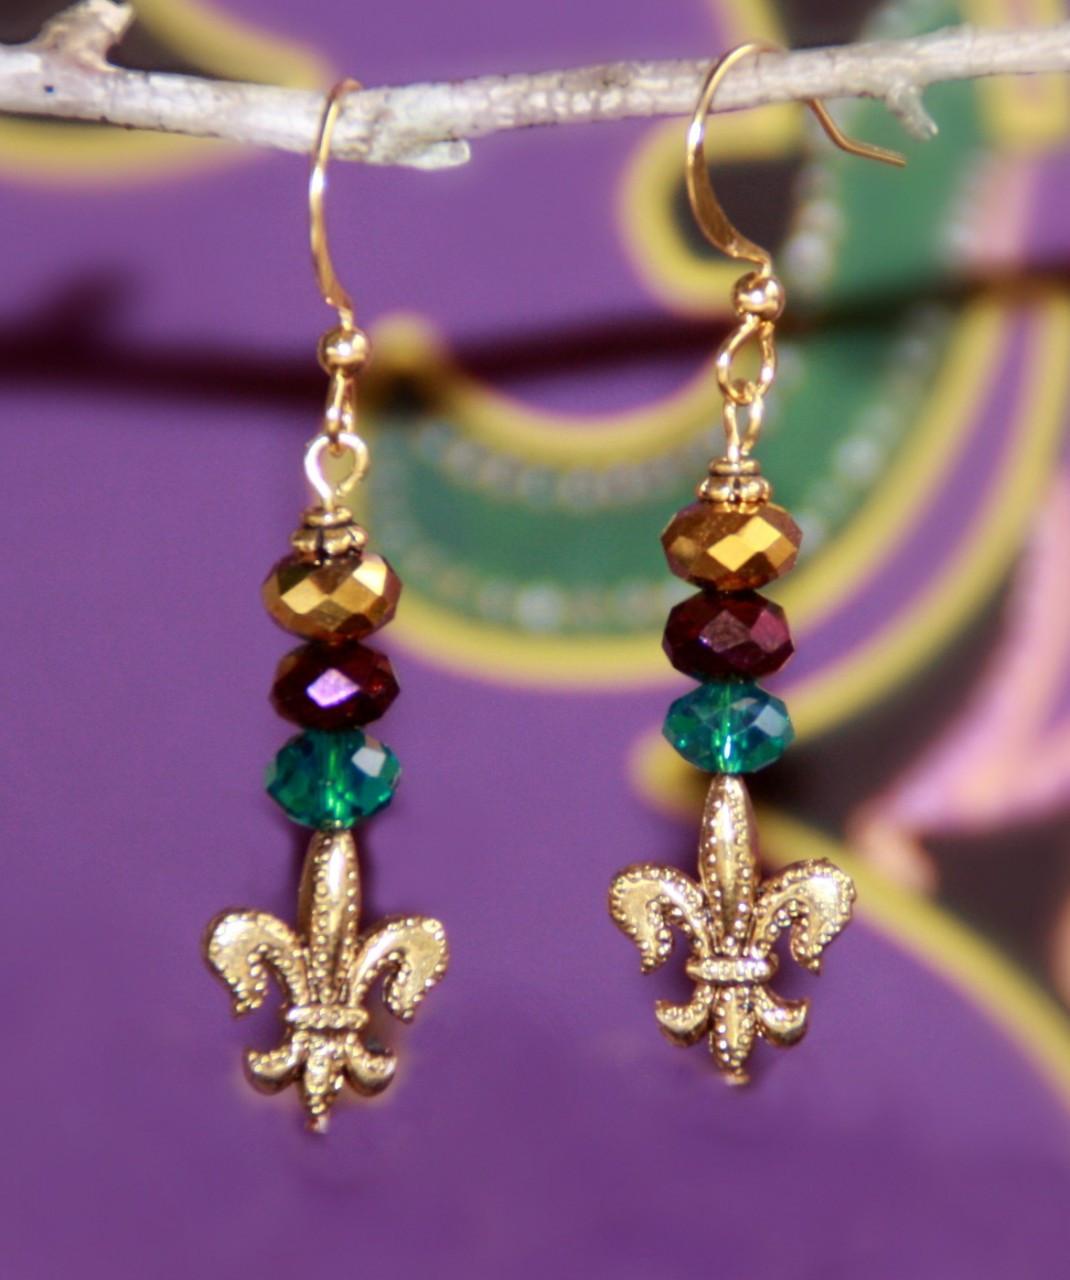 FER-249 Mardi Gras color Fleur de Lis Earrings